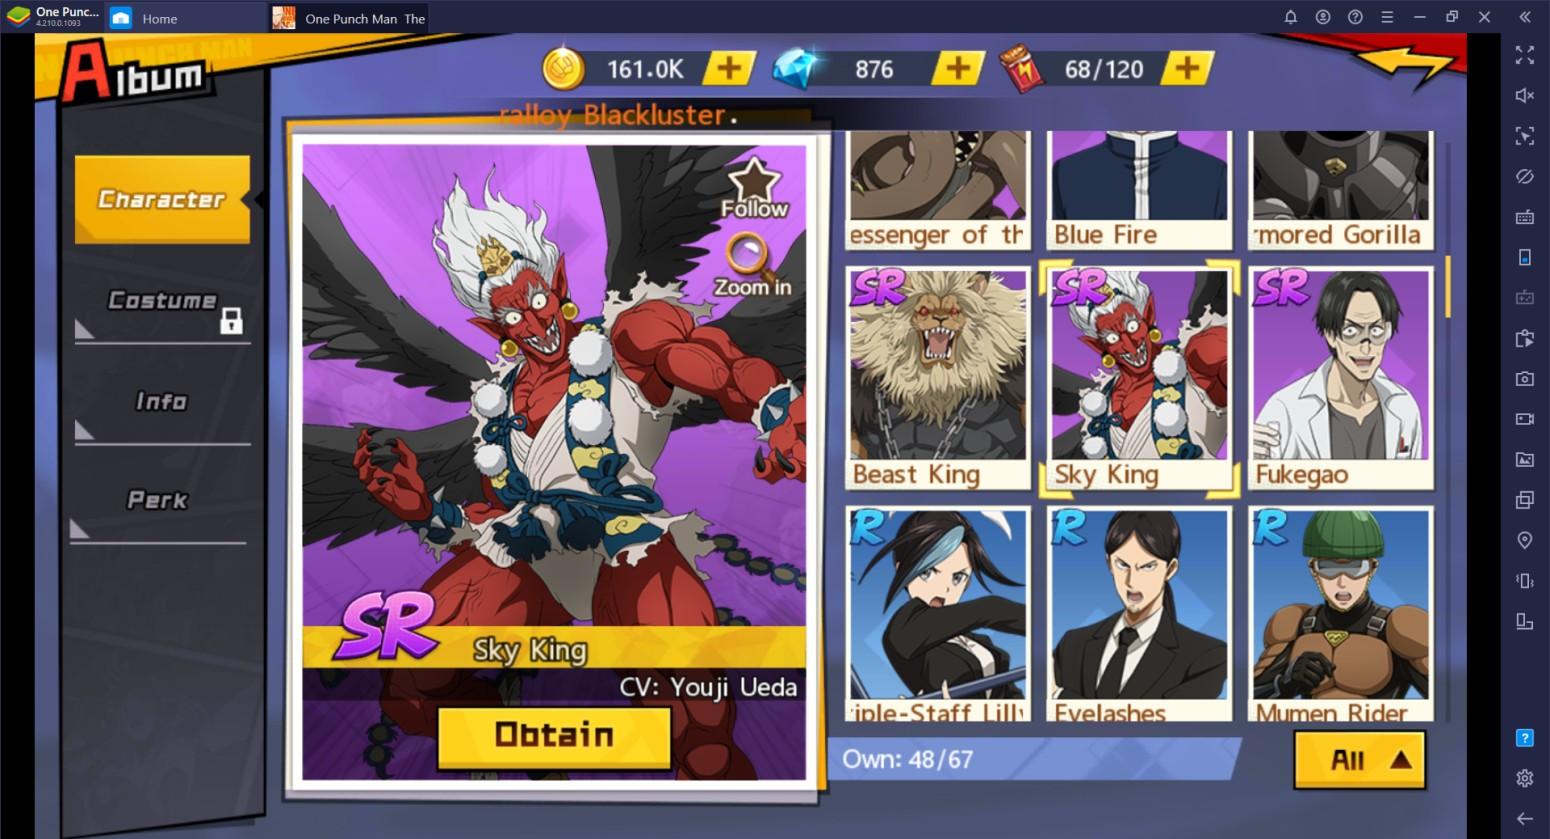 One Punch Man: The Strongest: Daftar Tier Unit – Unit Terbaik di Game